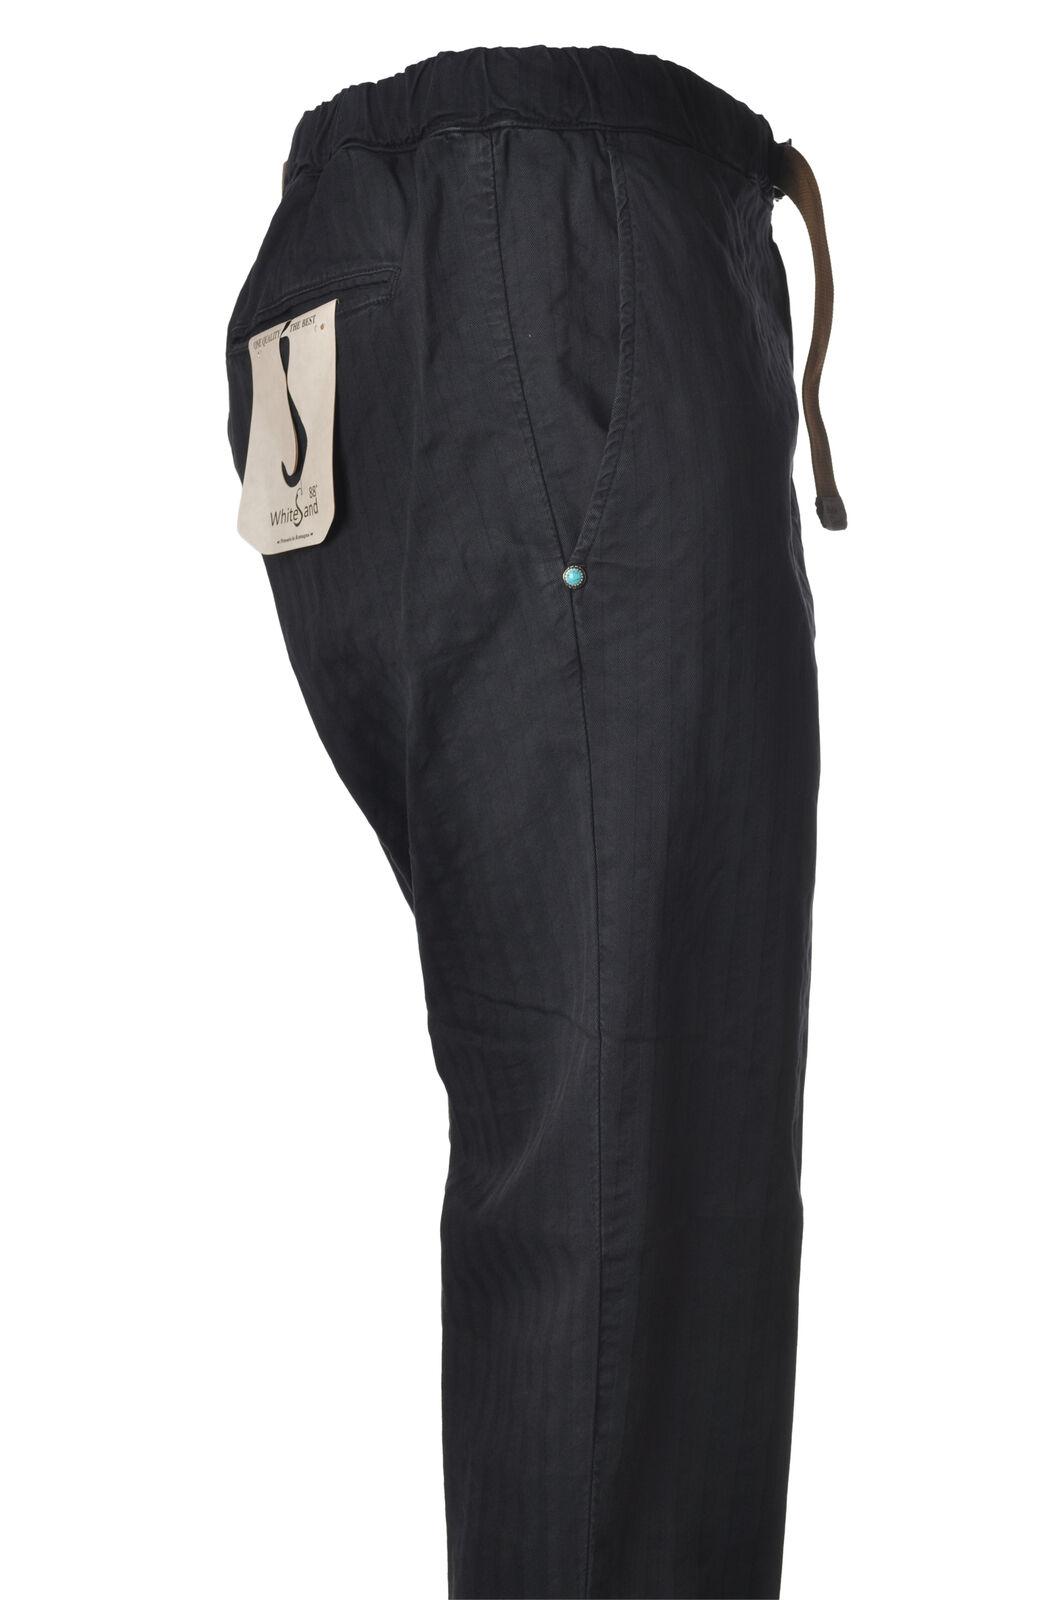 bianca sand - Pantaloni-Pantaloni - Uomo - Blu - 6044415C191202